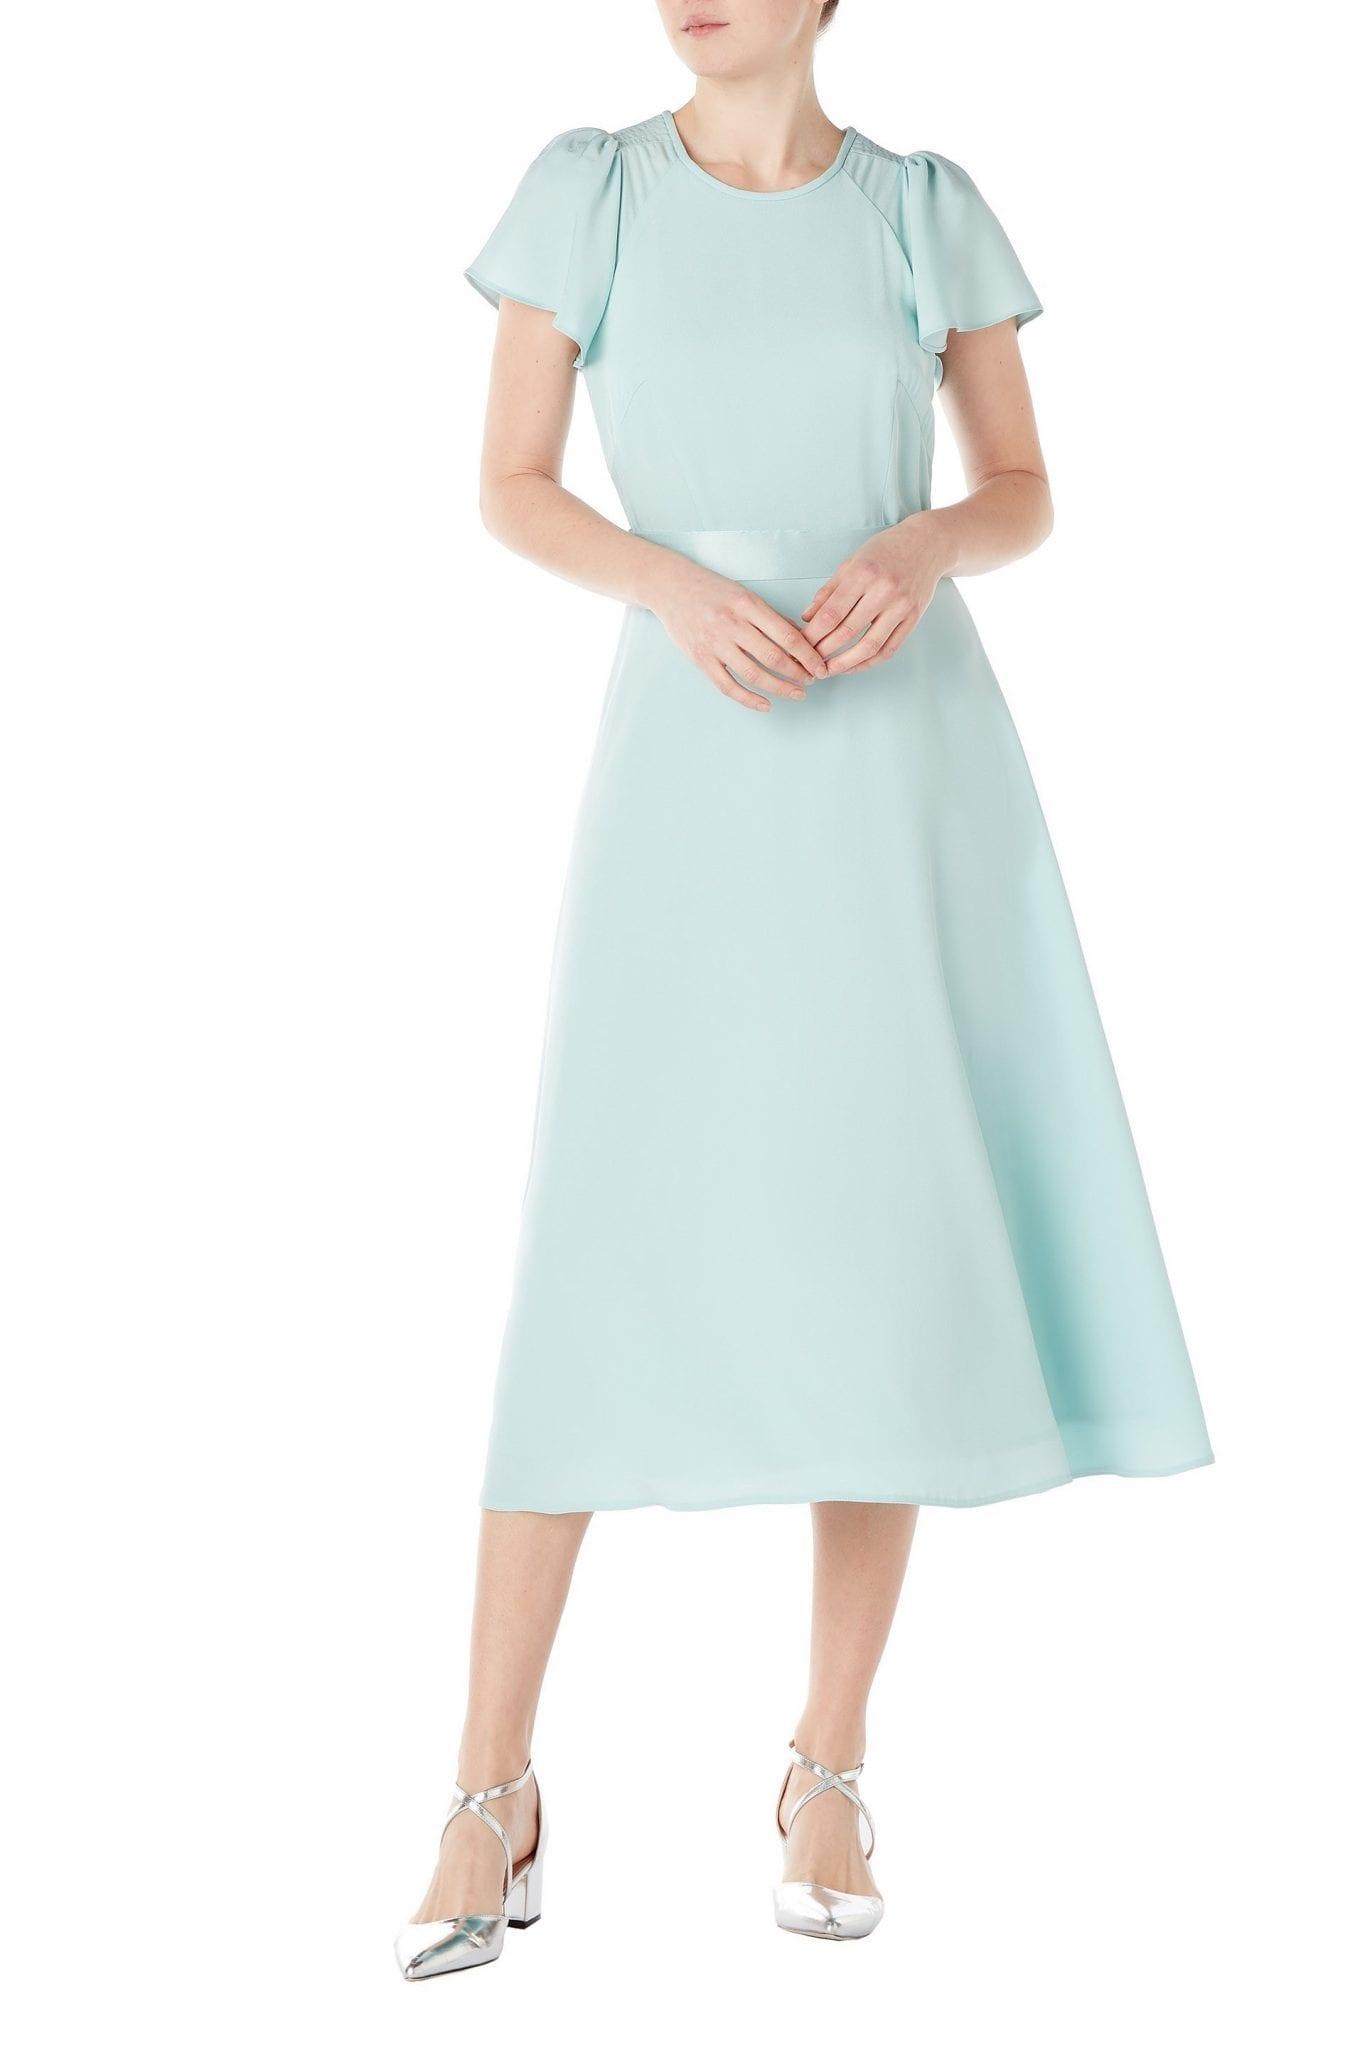 GOAT FASHION Jewel Cady Midi Dress